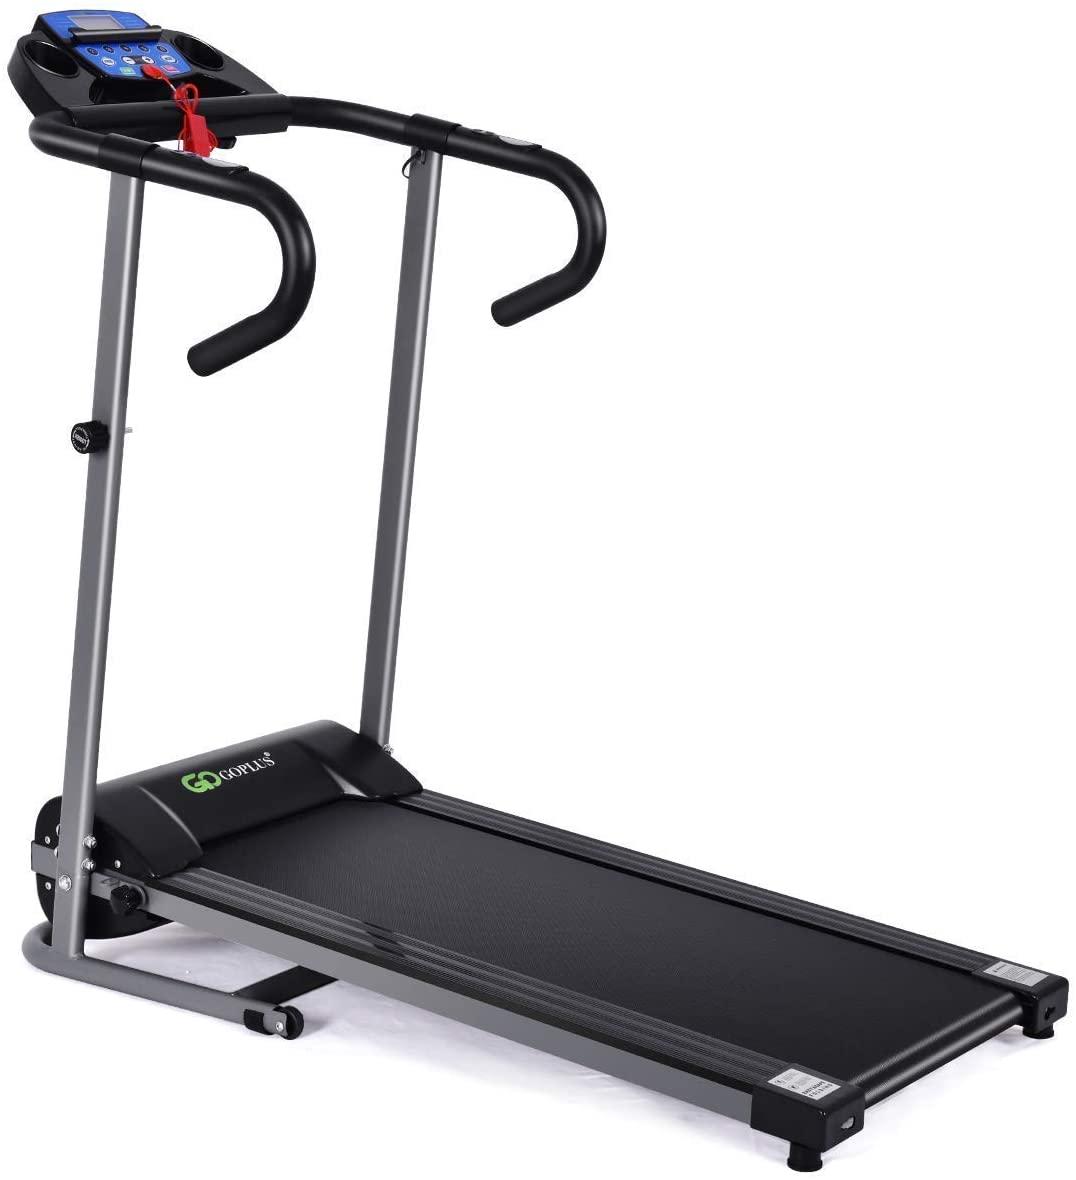 Goplus 1100W Electric Folding Treadmill